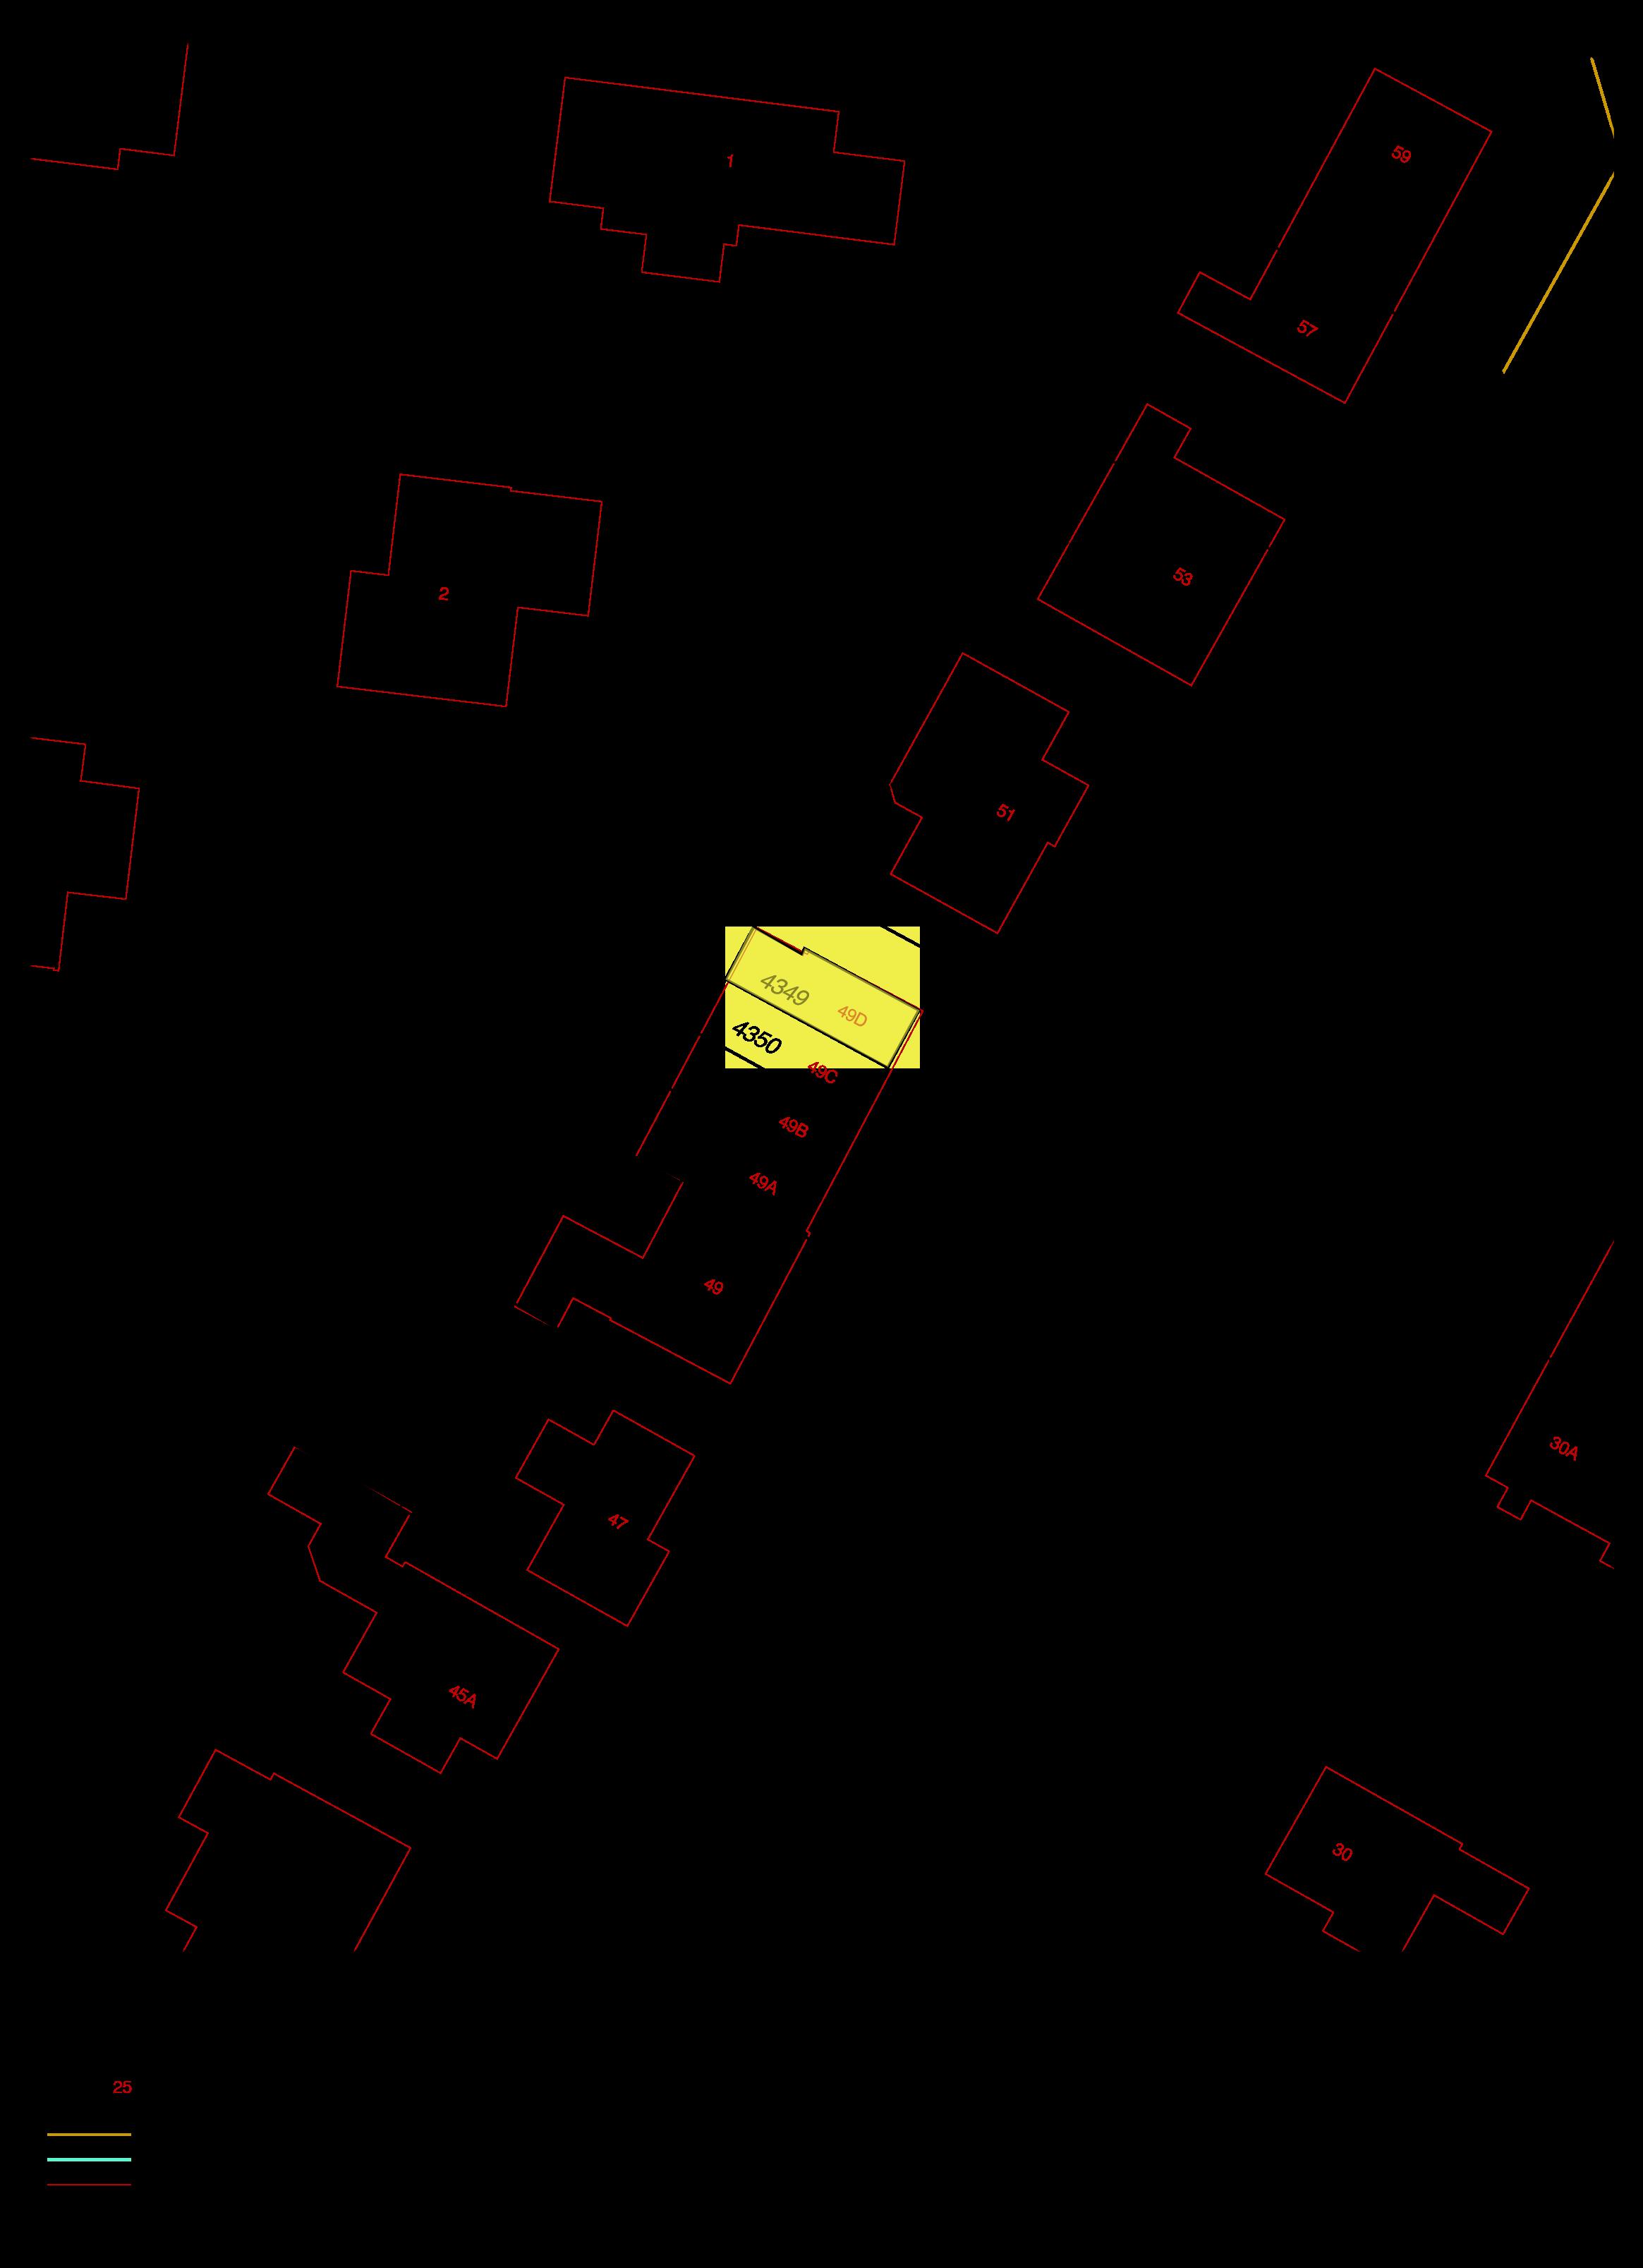 kadastrale kaart clara